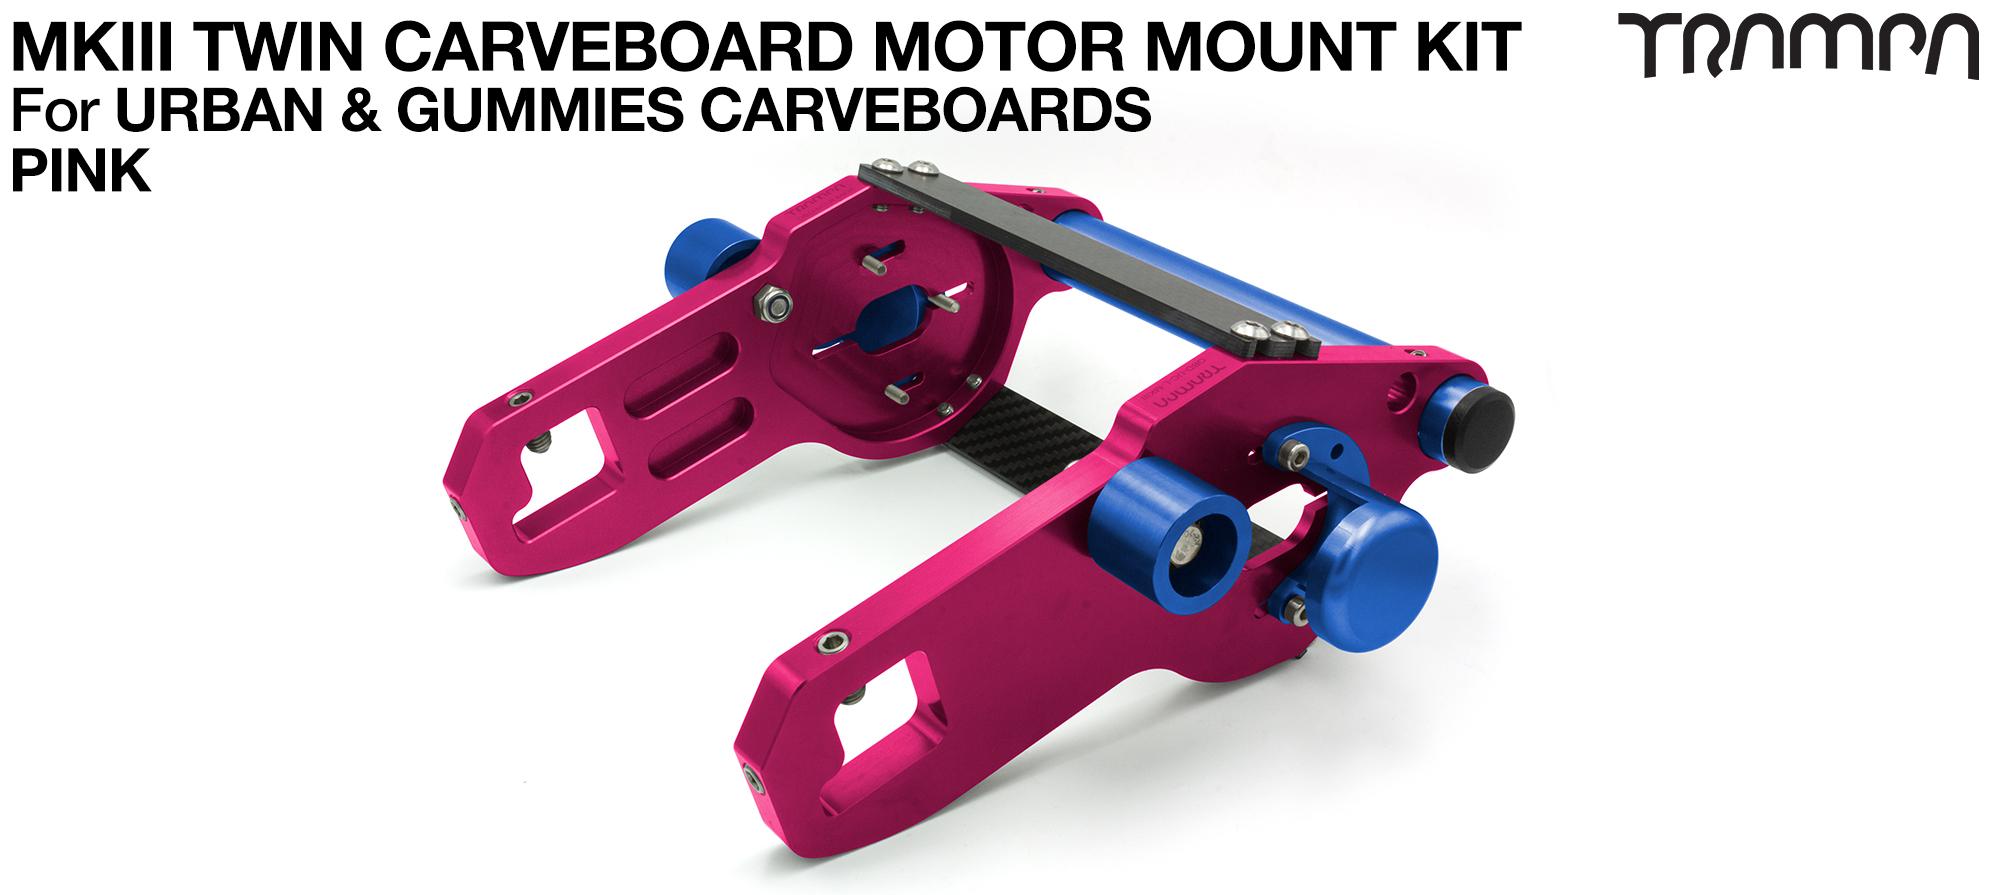 MkIII CARVE BOARD Motor Mount Kit - TWIN PINK